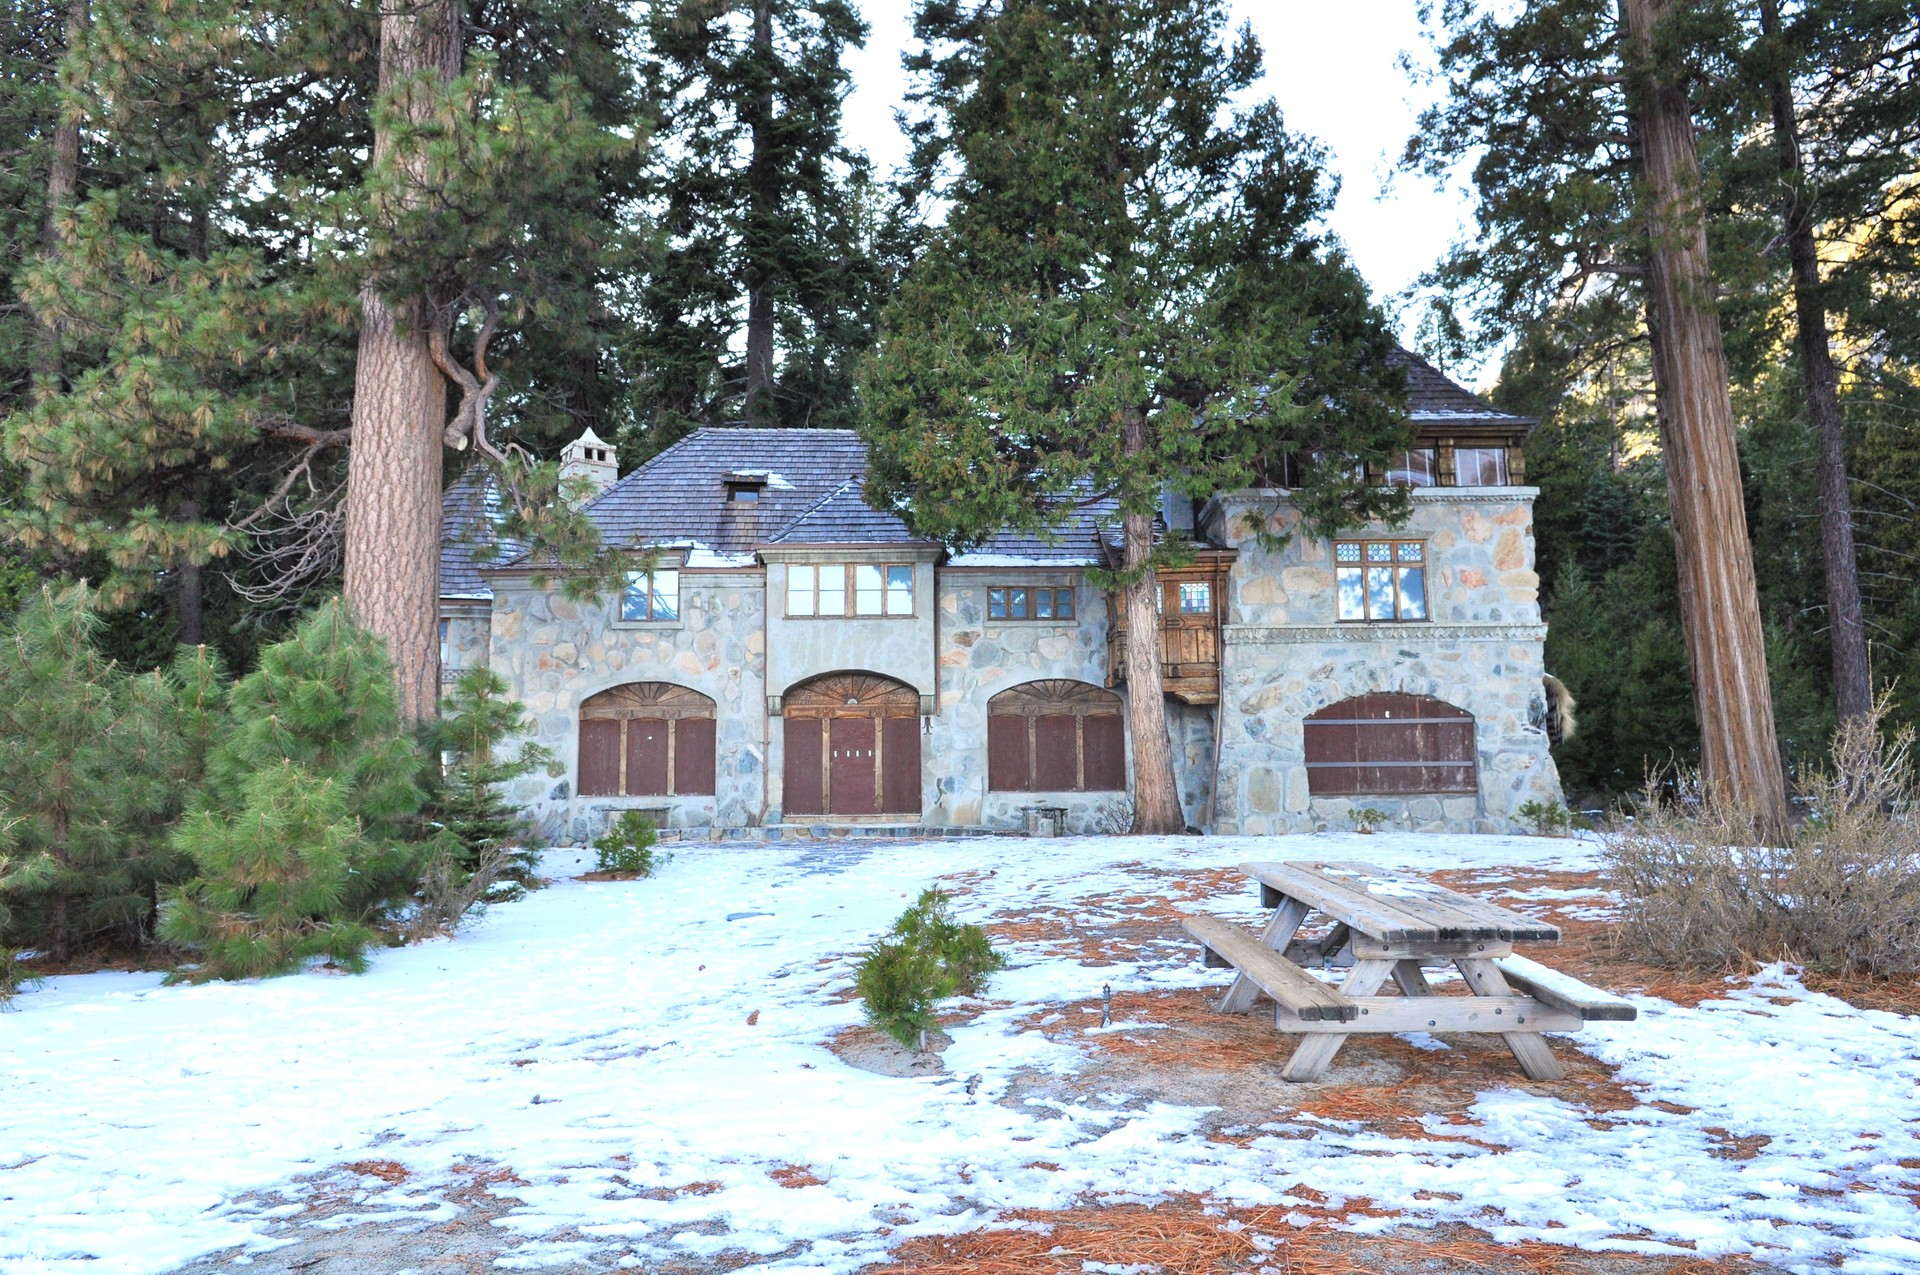 Winter castle | margosha, house, no person, wood